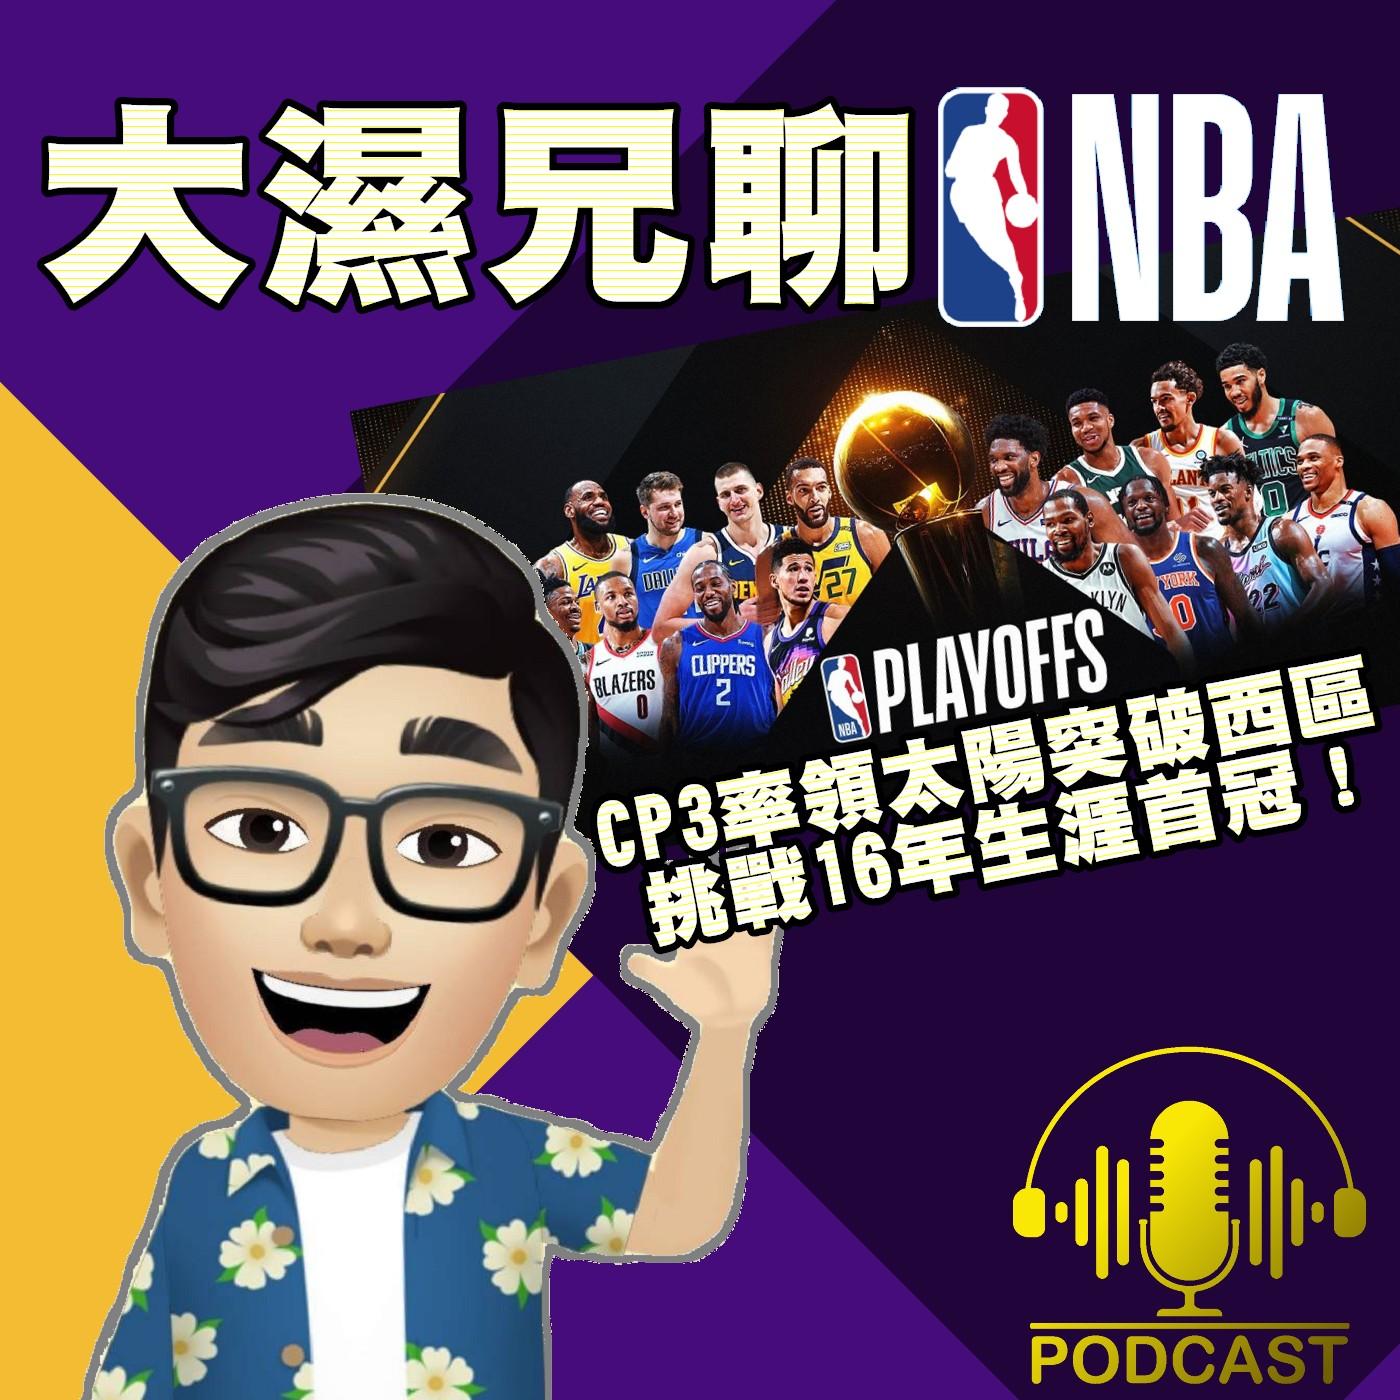 EP.33【NBA時間】CP3率領太陽突破西區、挑戰16年生涯首冠!